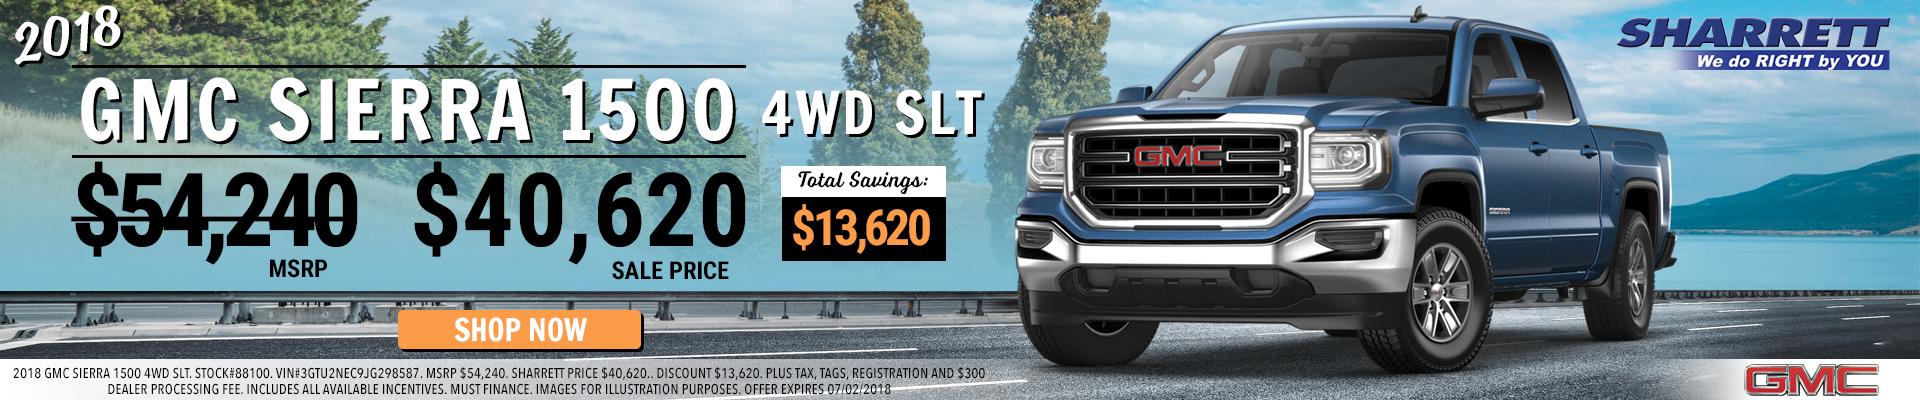 Save $13,620 on a New GMC Sierra 1500 4WD SLT